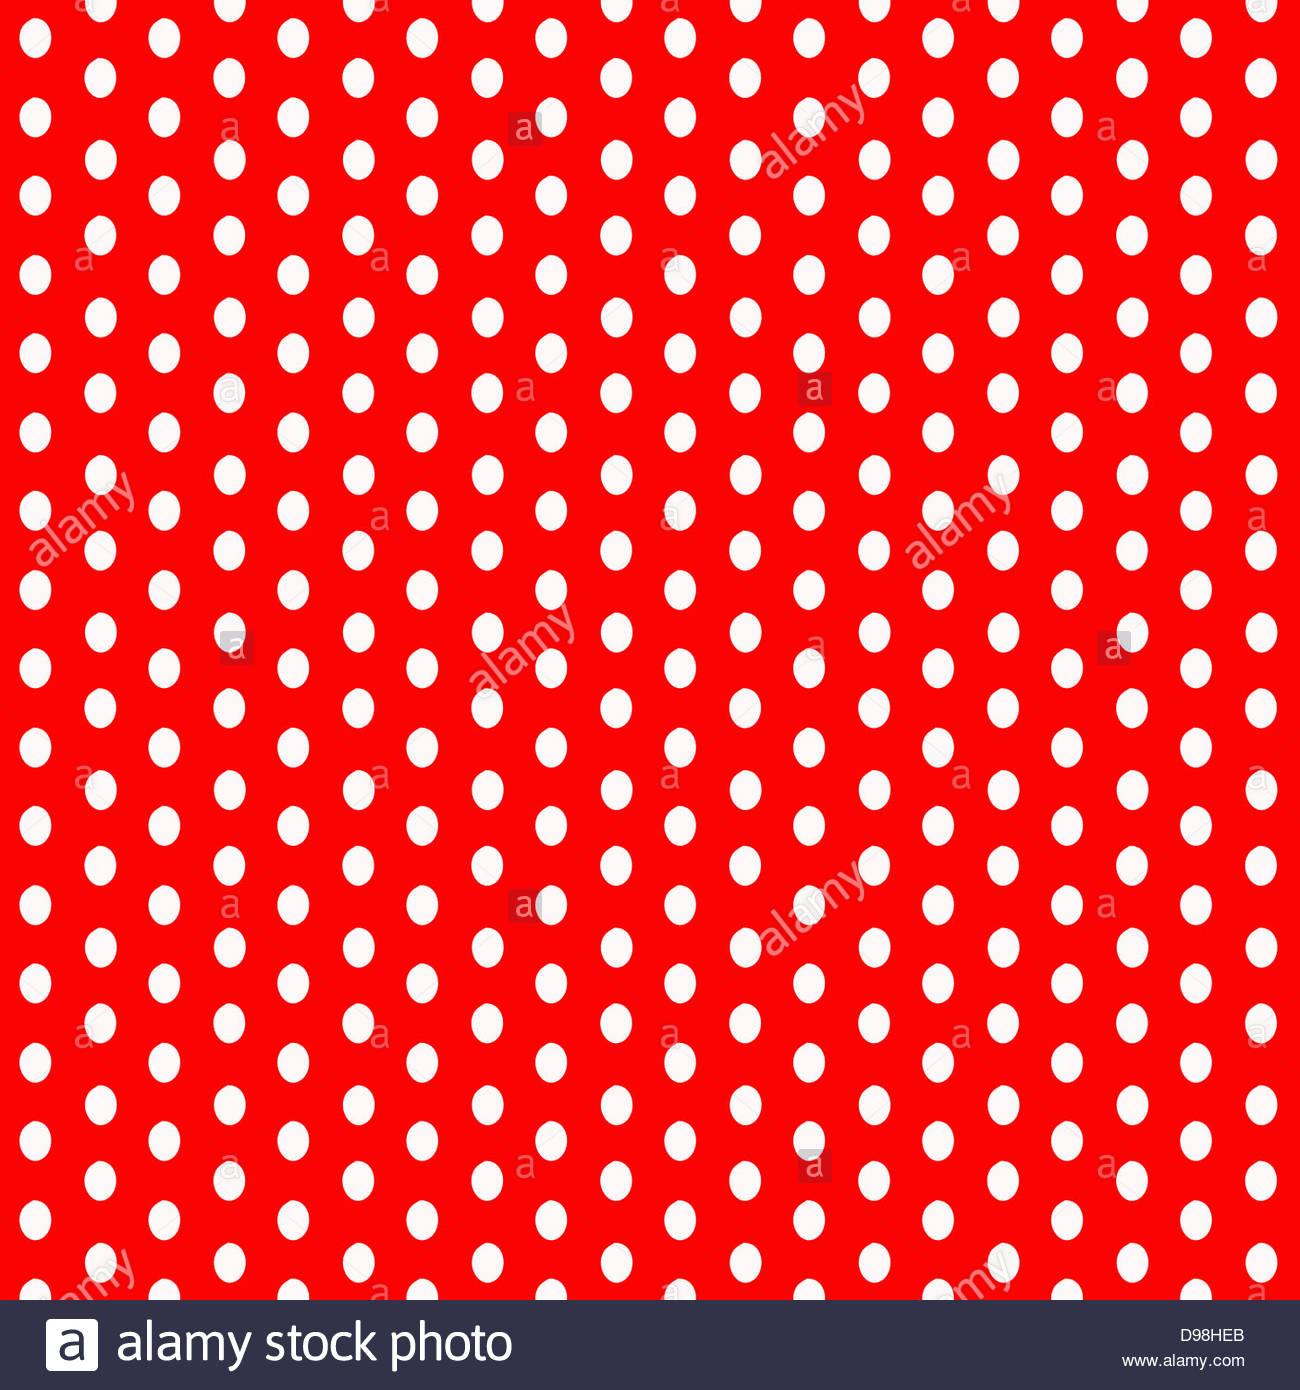 red white dots wallpaper - photo #27